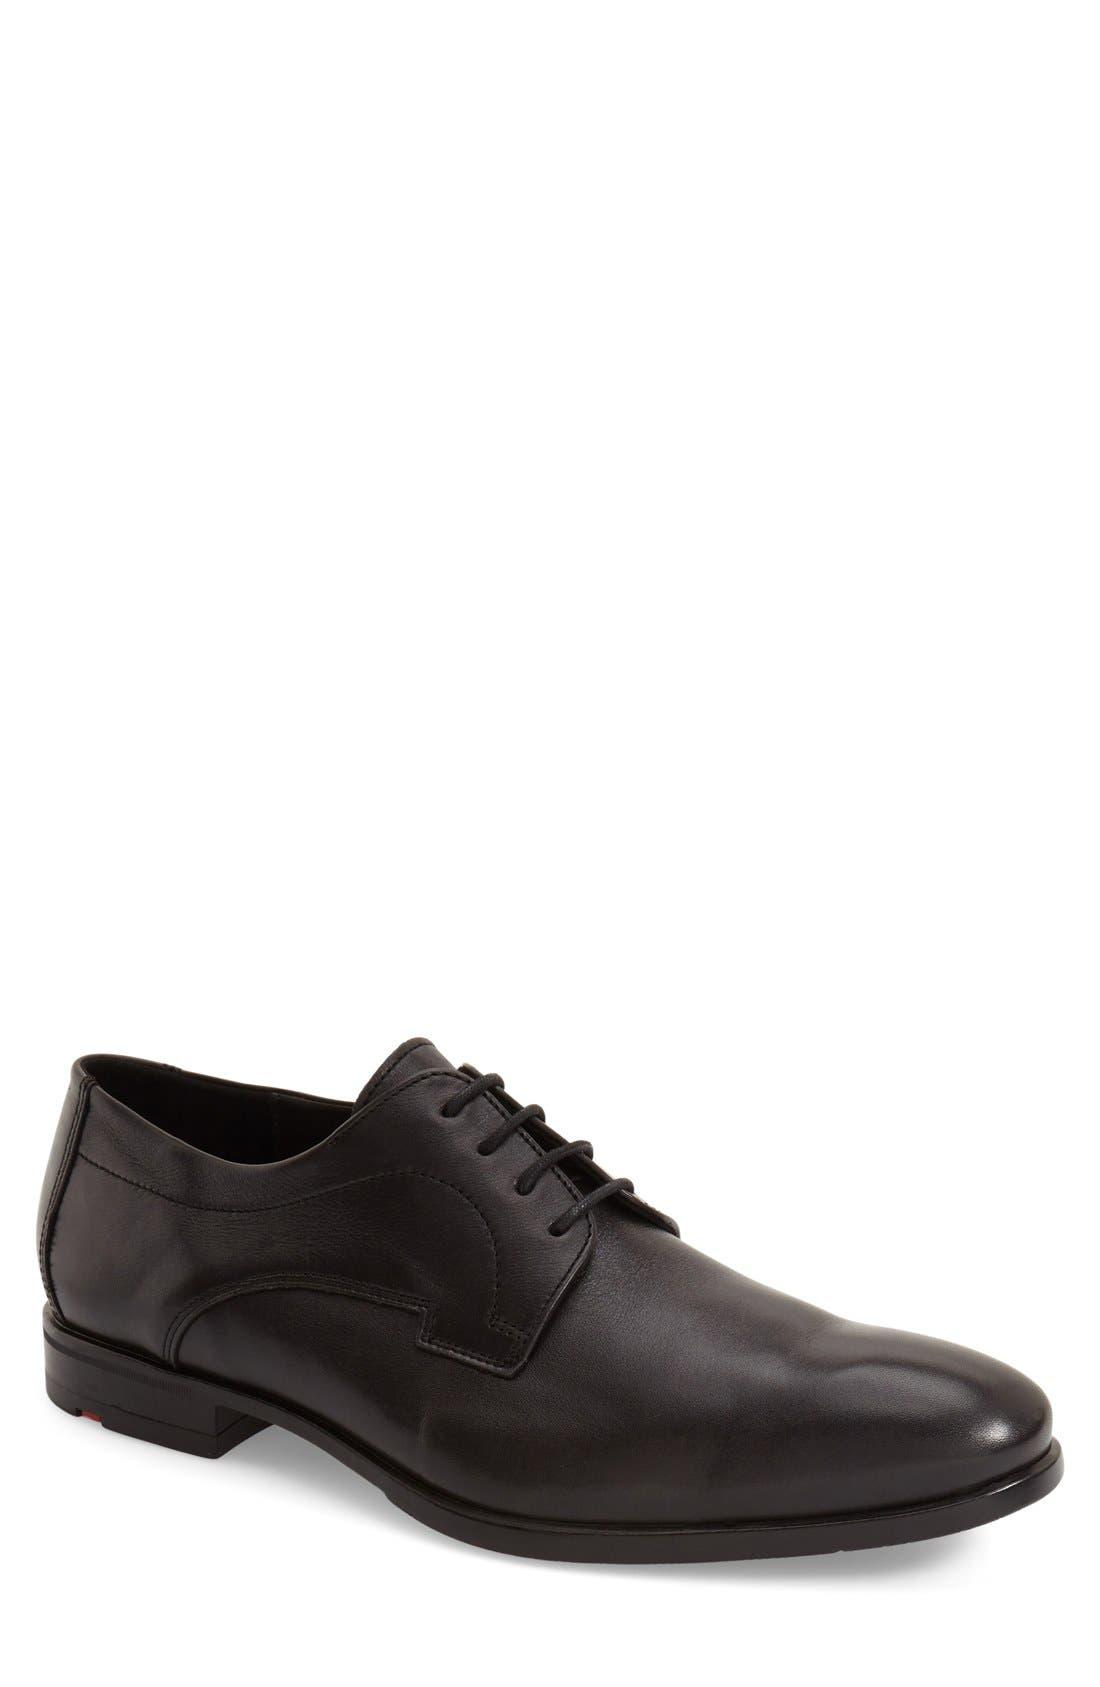 Lloyd 'Recit' Plain Toe Derby (Men)